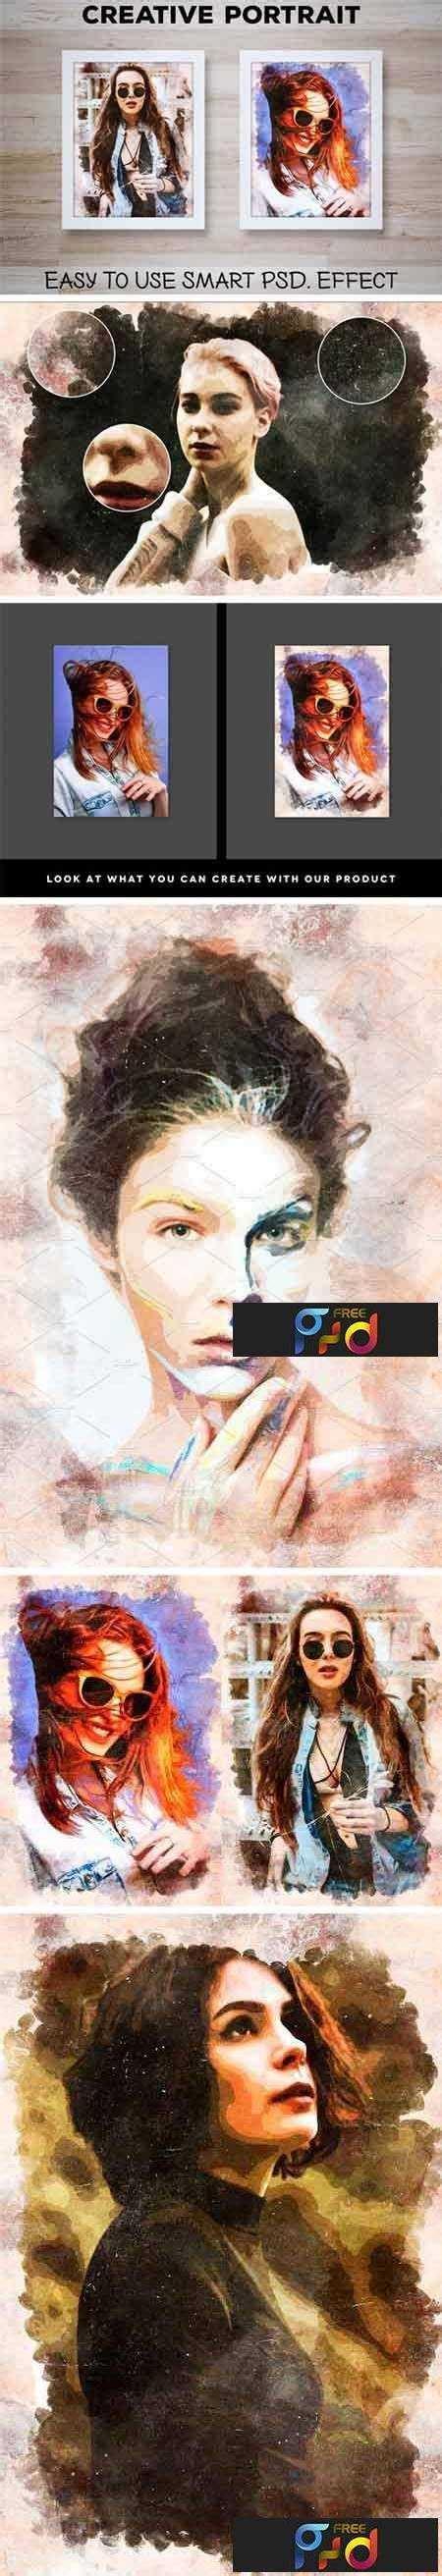 creative portrait smart psd effect  freepsdvn